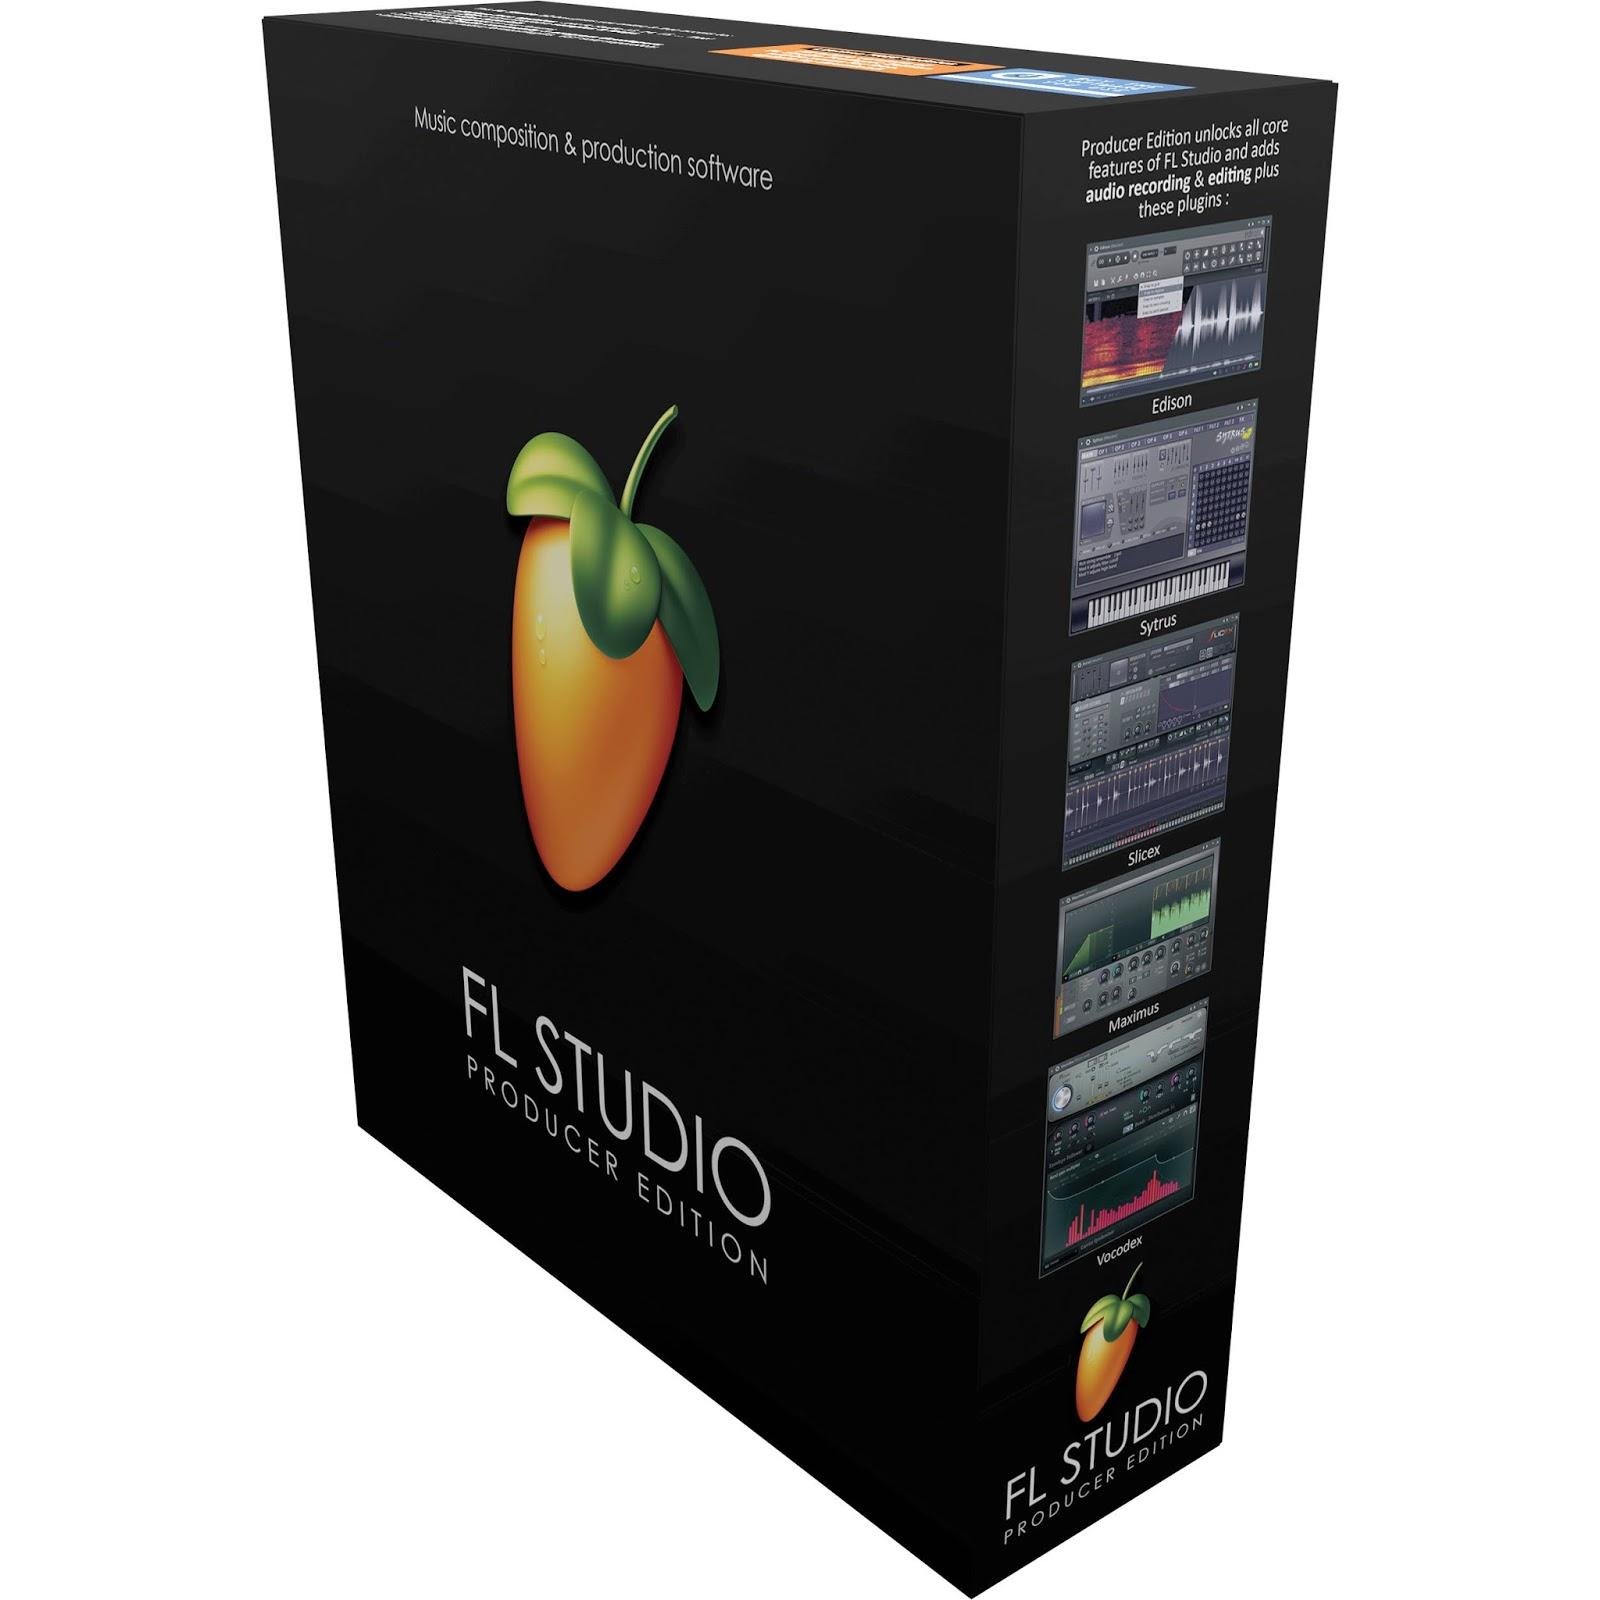 fl studio 10 producer edition full free download